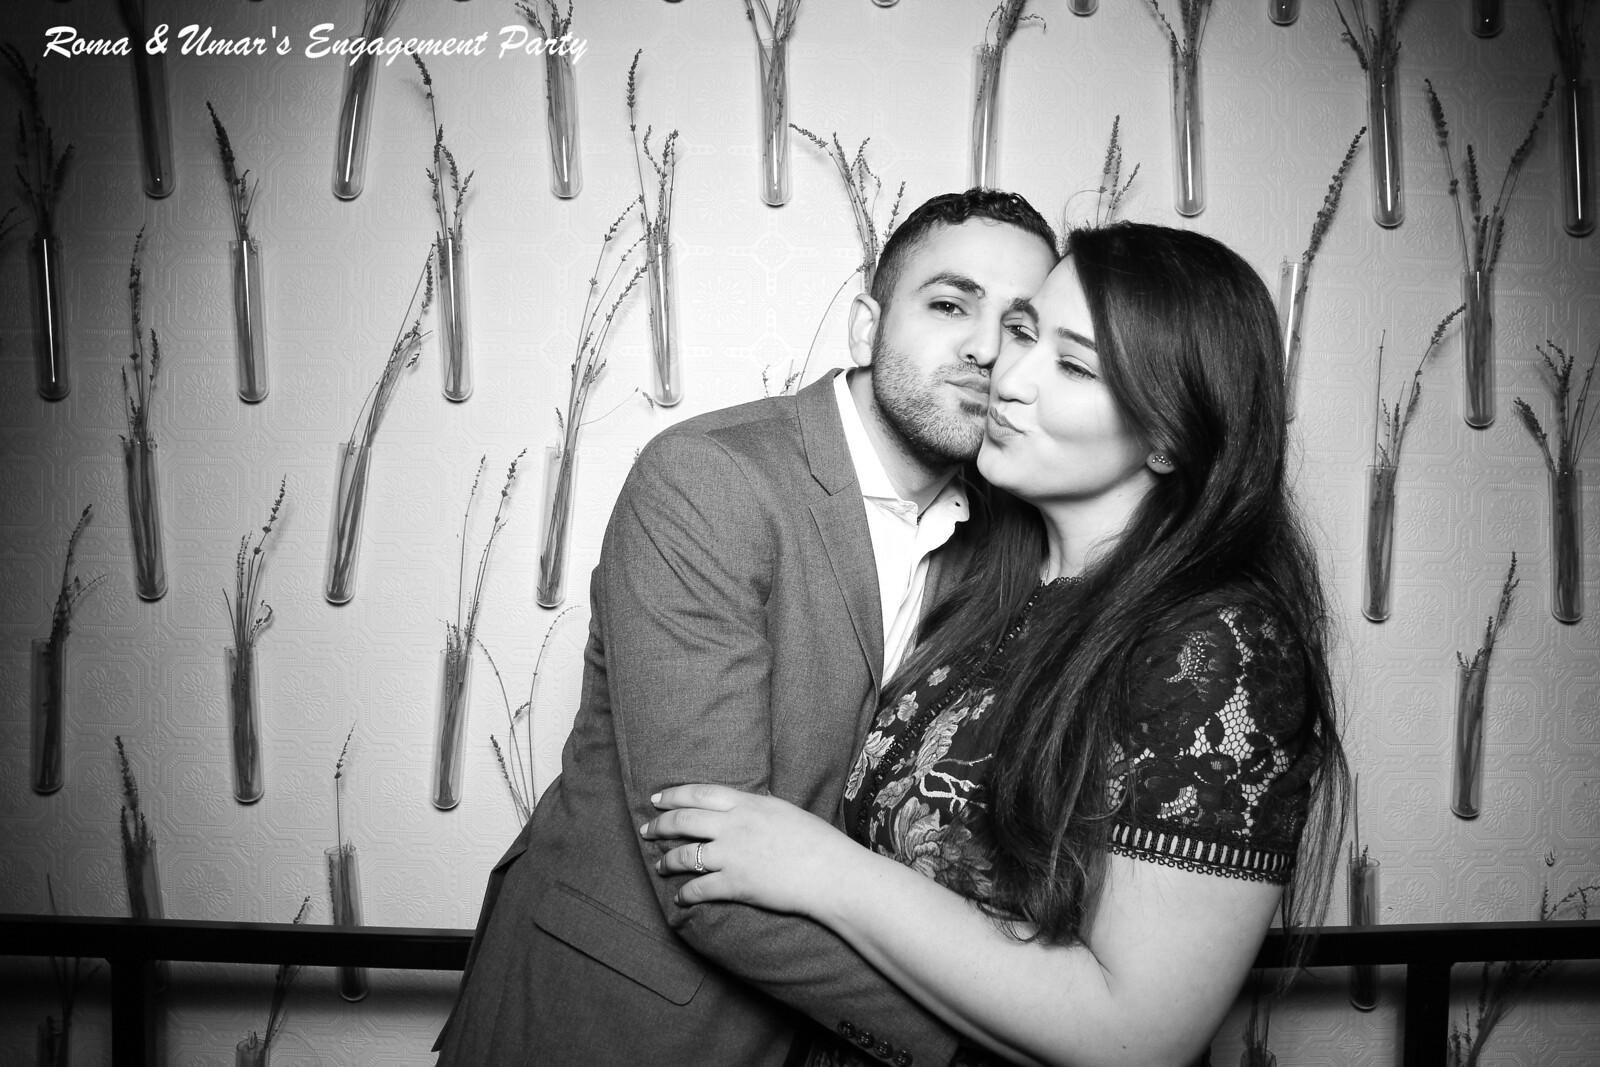 Chicago_Vintage_Wedding_Engagement_Photobooth_Nellcote_08.jpg